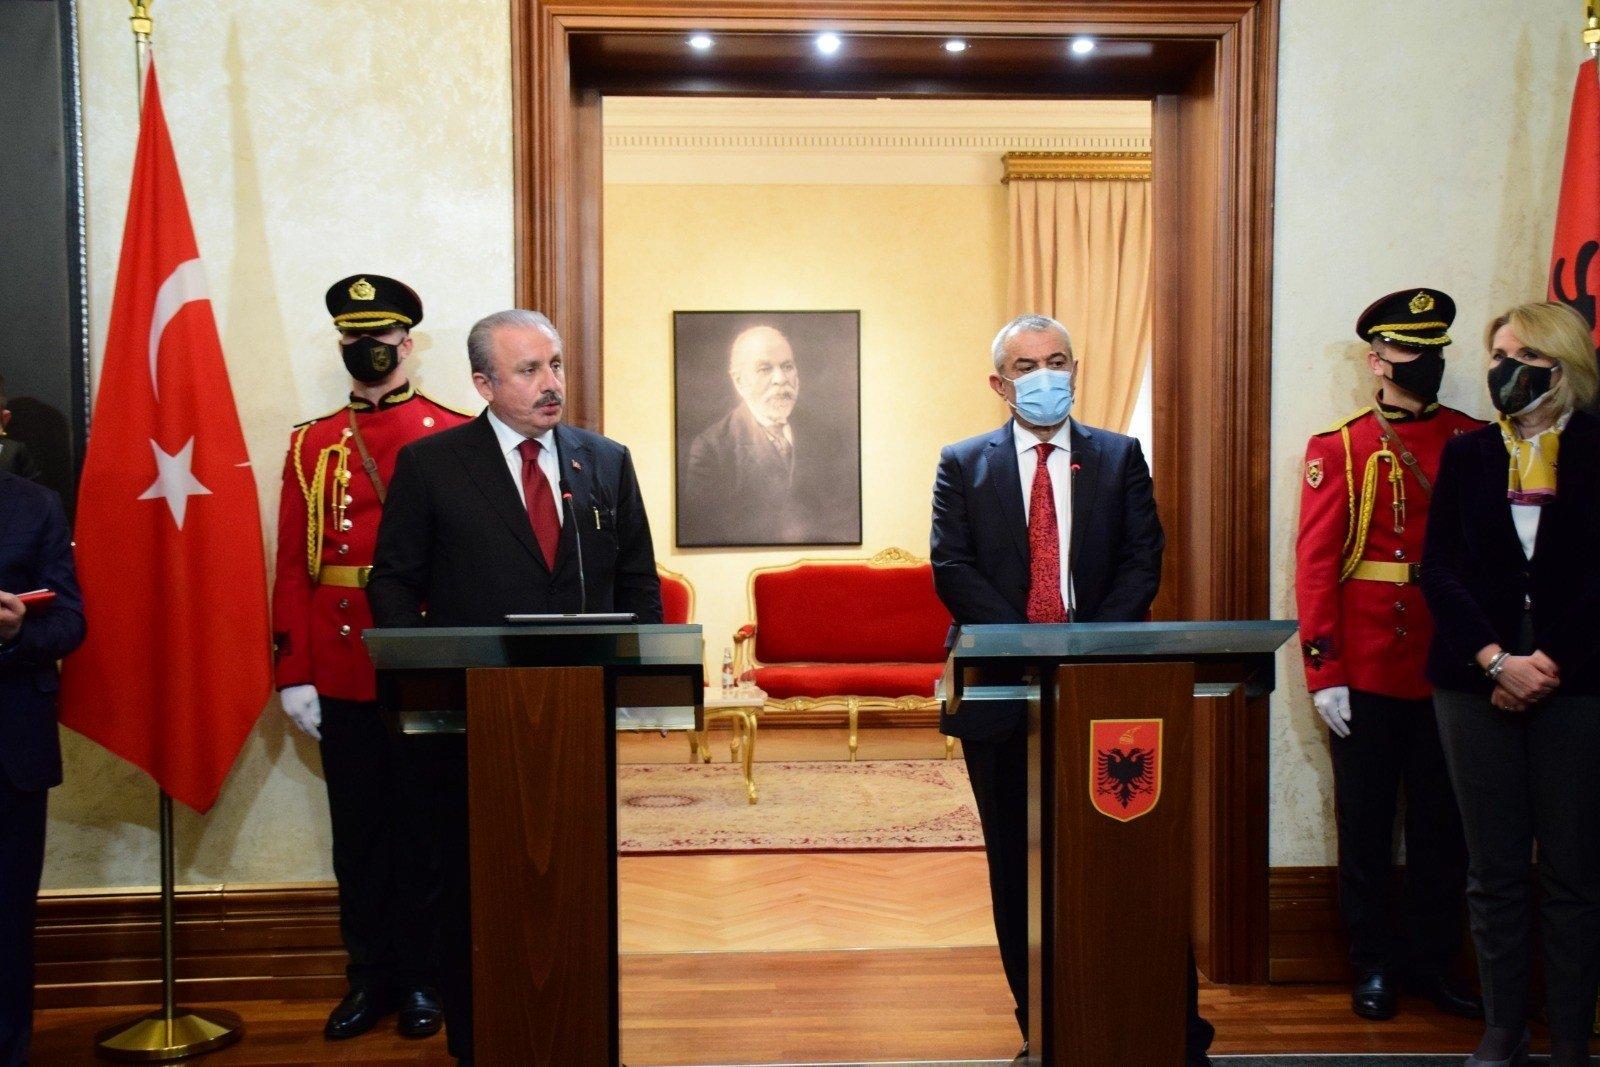 Parliament Speaker Mustafa Şentop in a joint news conference with his Albanian counterpart Gramoz Ruci, Tirana, Albania, Feb. 4, 2021. (IHA Photo)